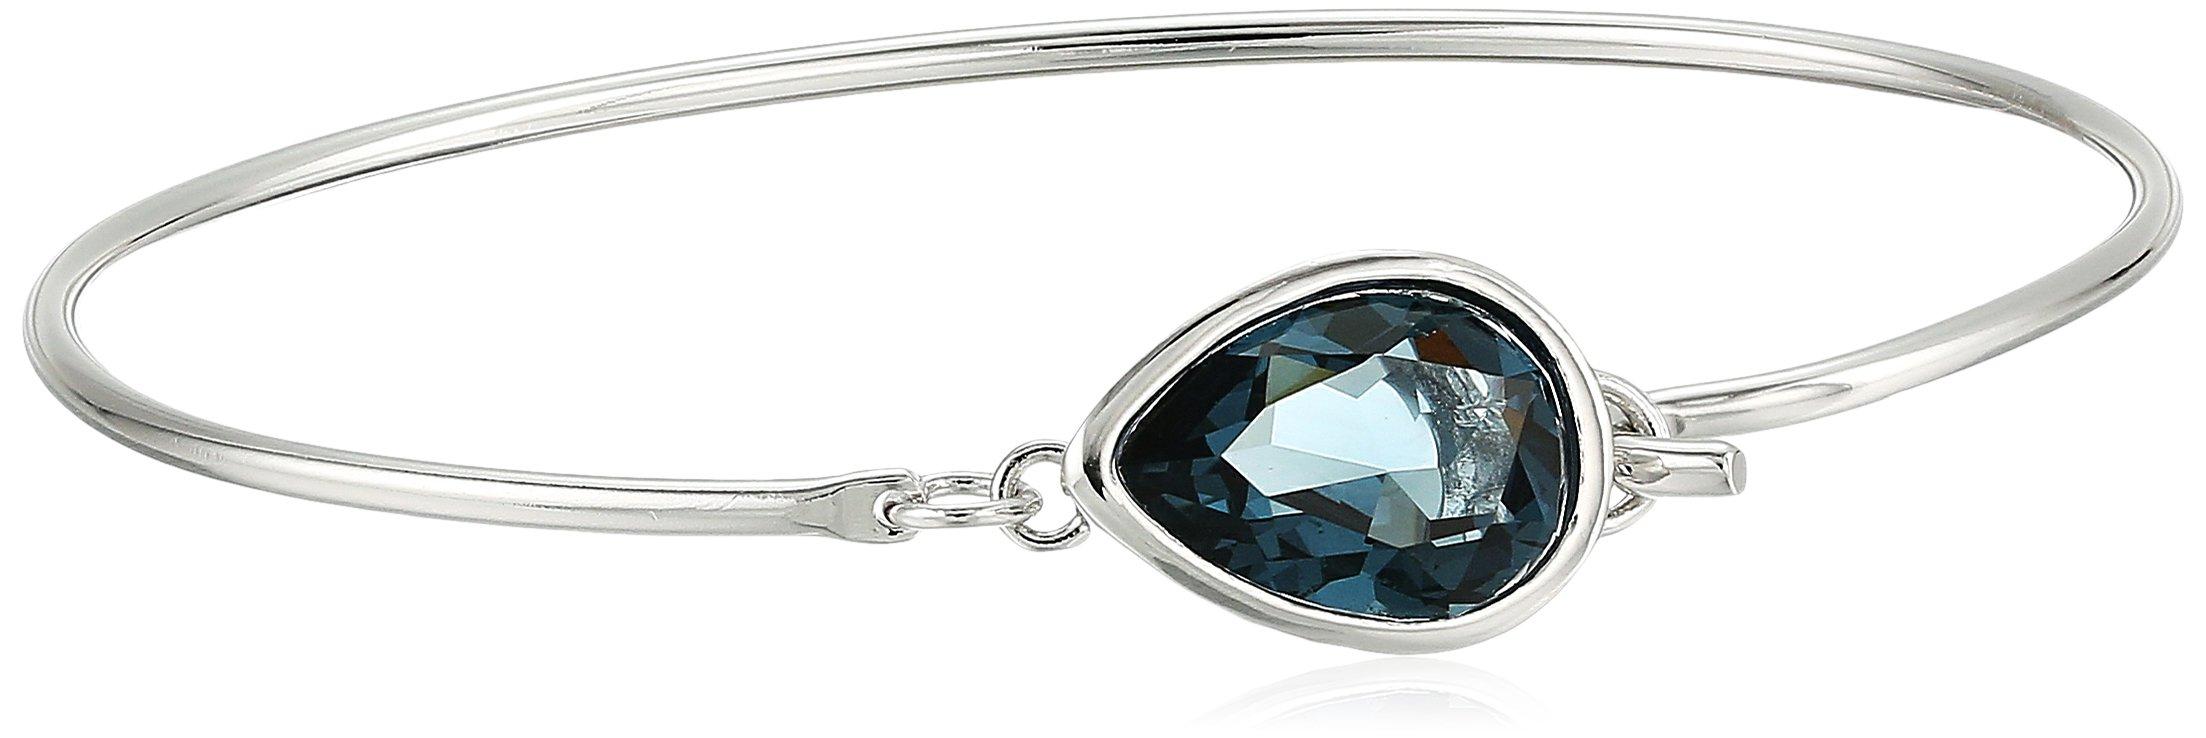 Fine Silver Plated Bronze Blue Teardrop Wire Bangle Bracelet Made with Swarovski Crystal (12mm, 7'')